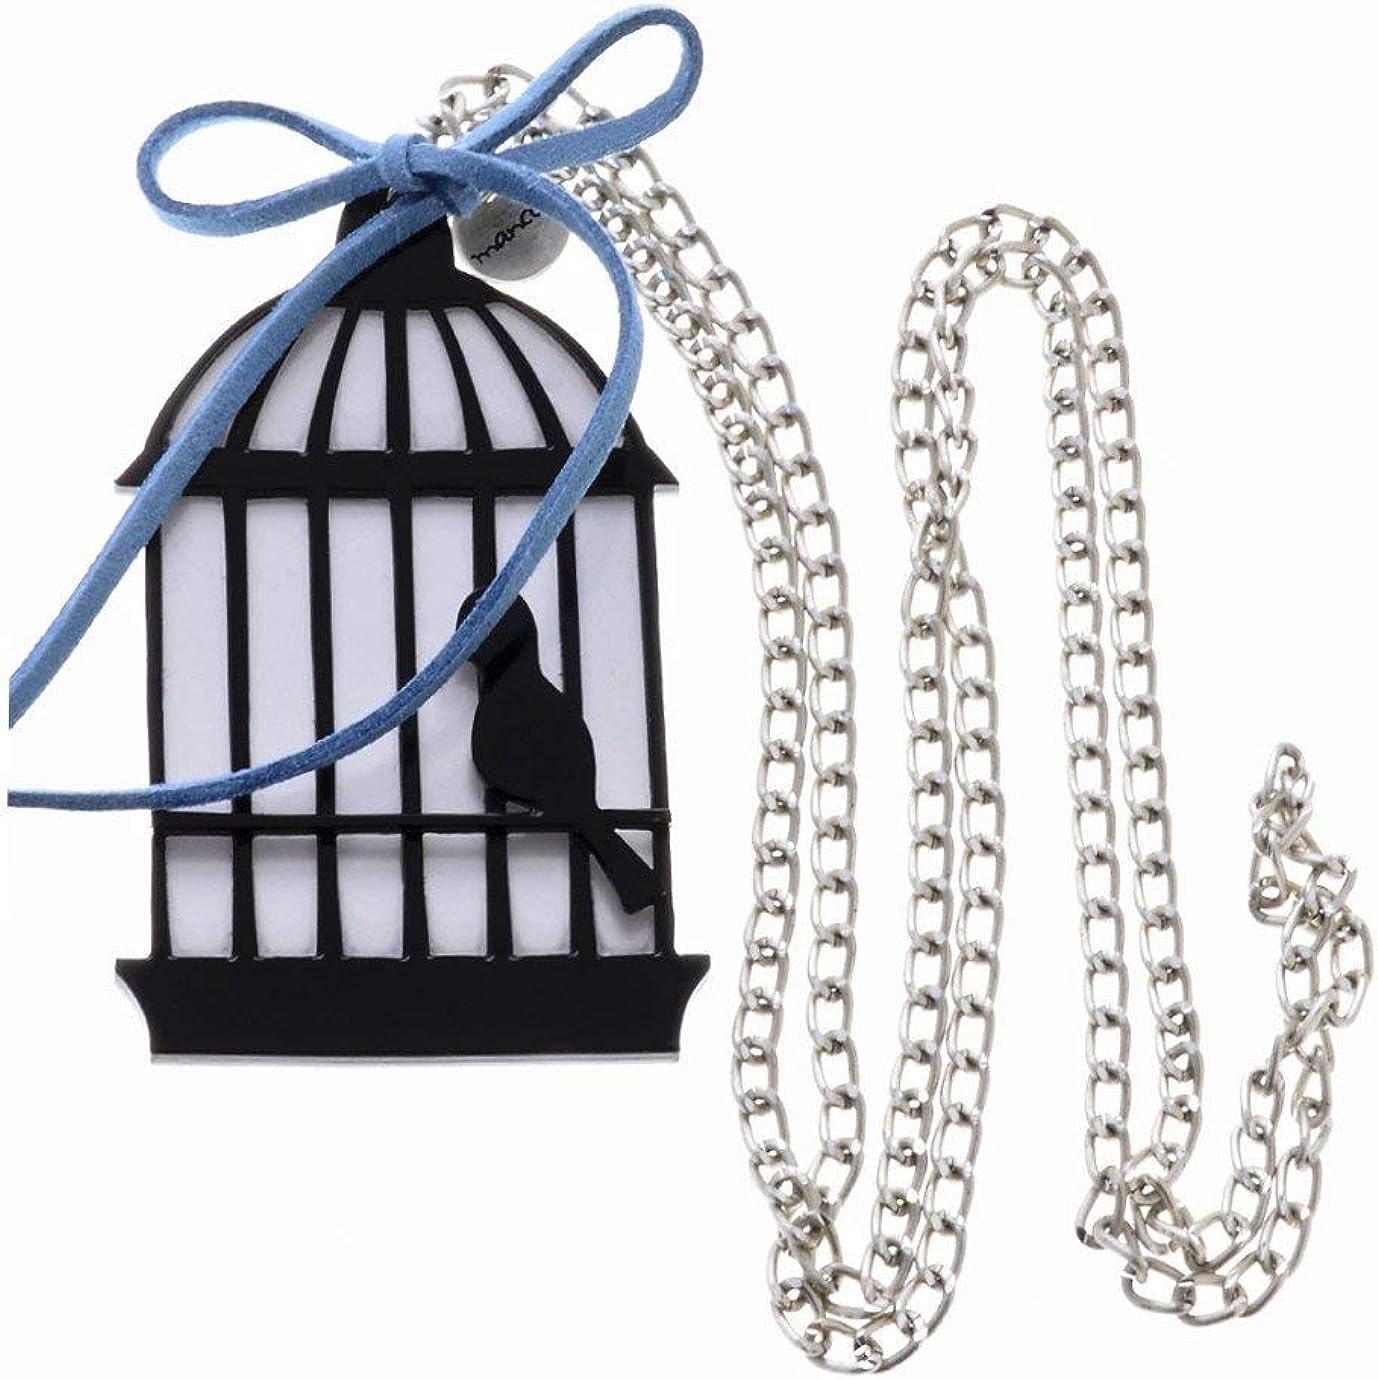 MANCOTI Bird CAGE Black Silver Chain Pendant